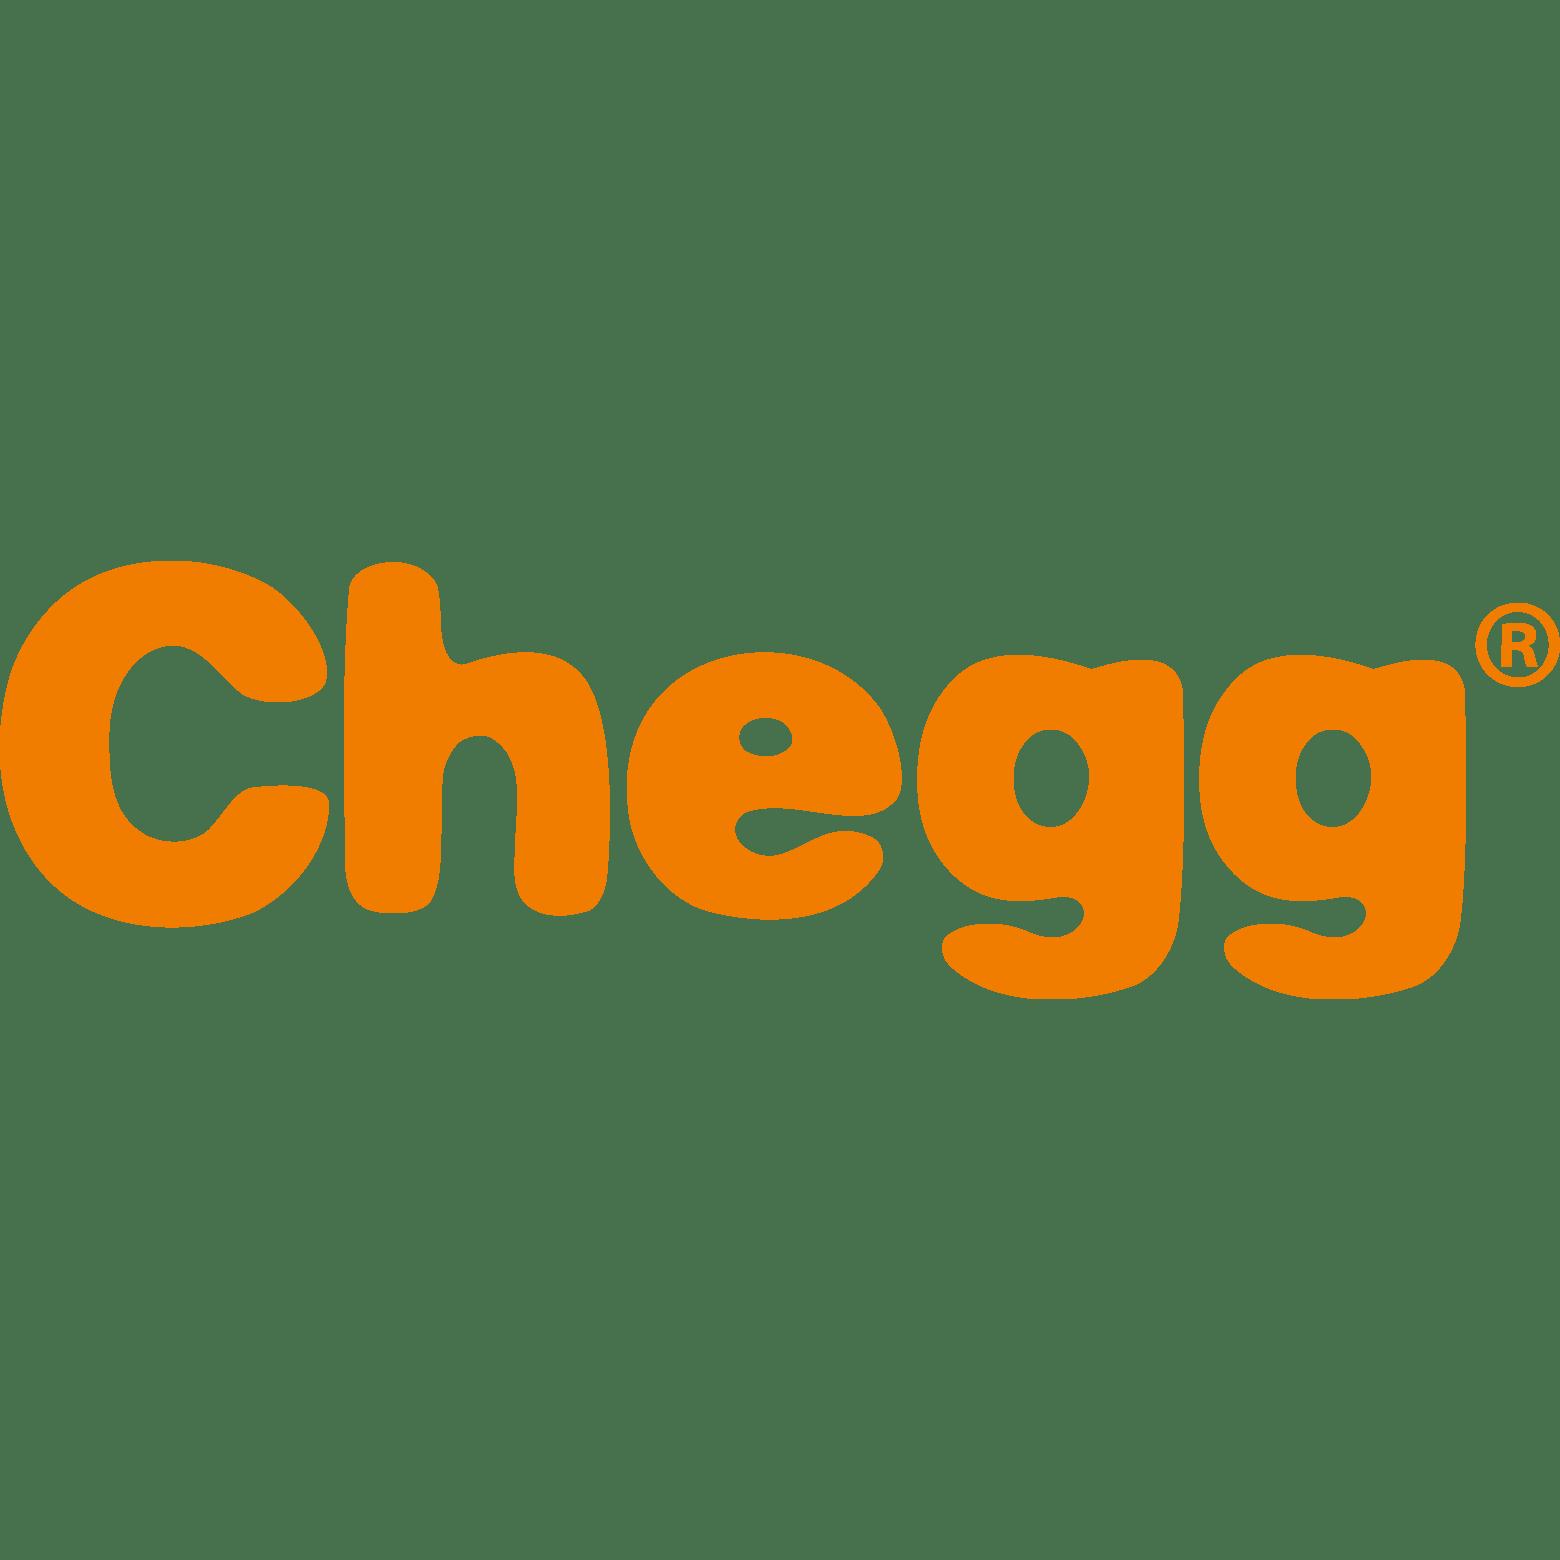 Chegg | Fundamentale Aktienanalyse